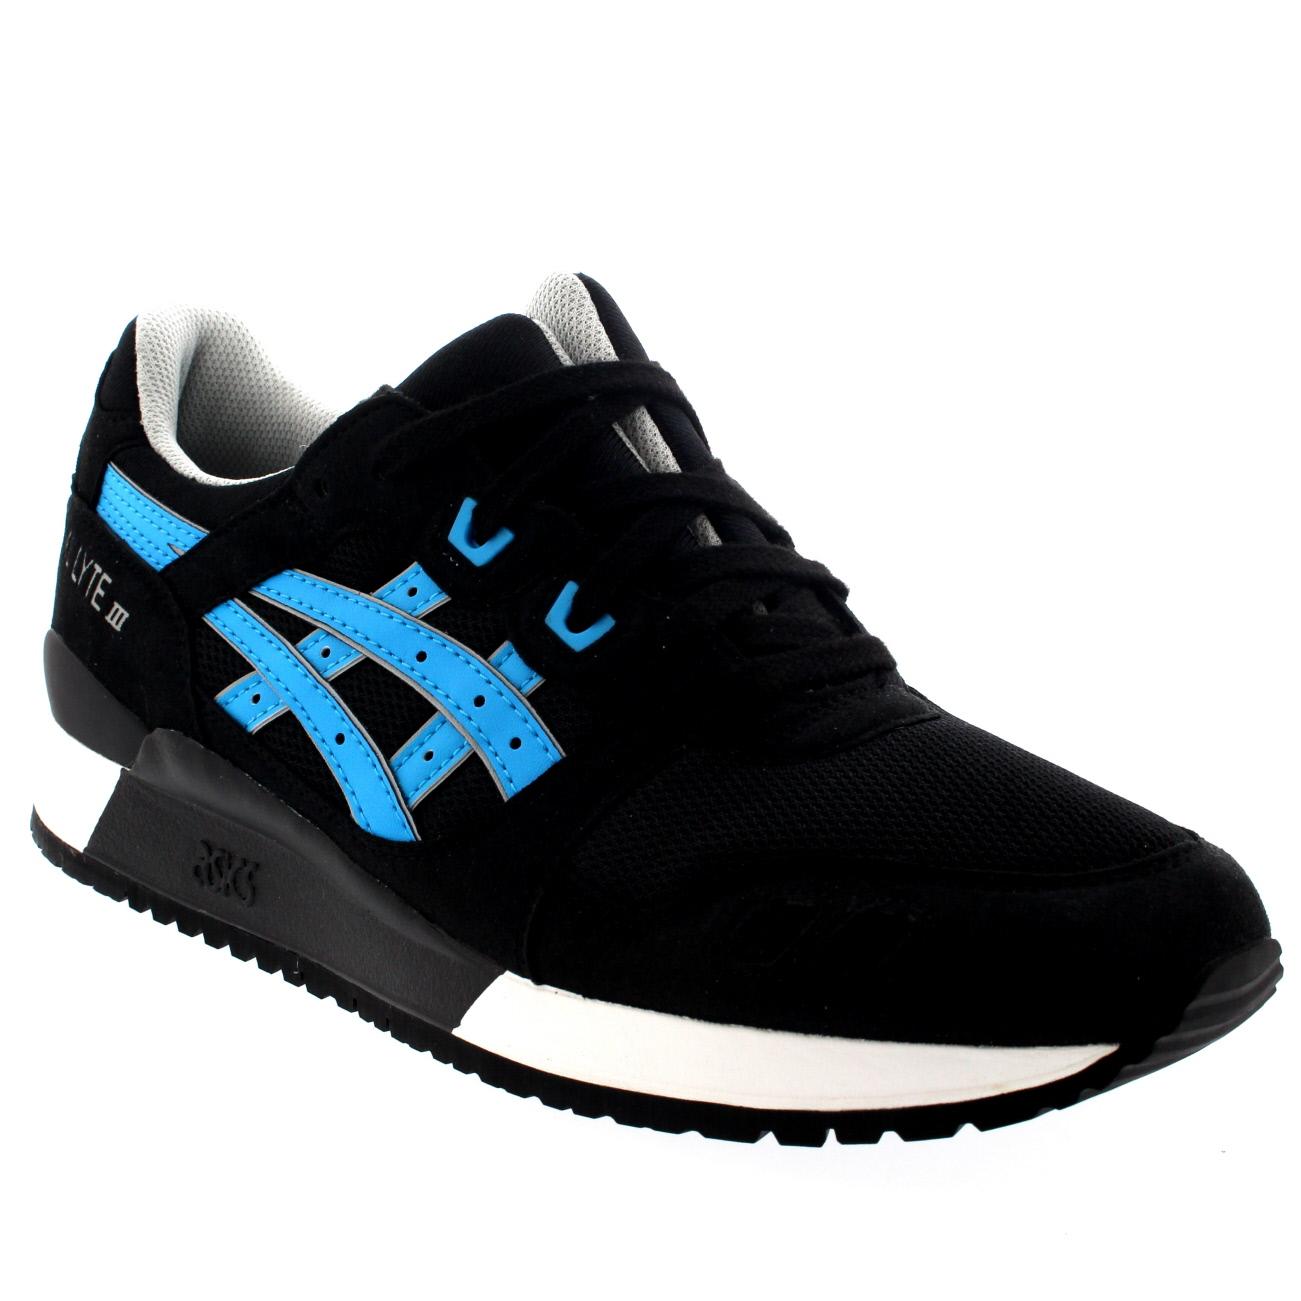 Mens Asics Gel-Lyte III Running Sports Fashion Walking Low Top Trainers UK 7-12